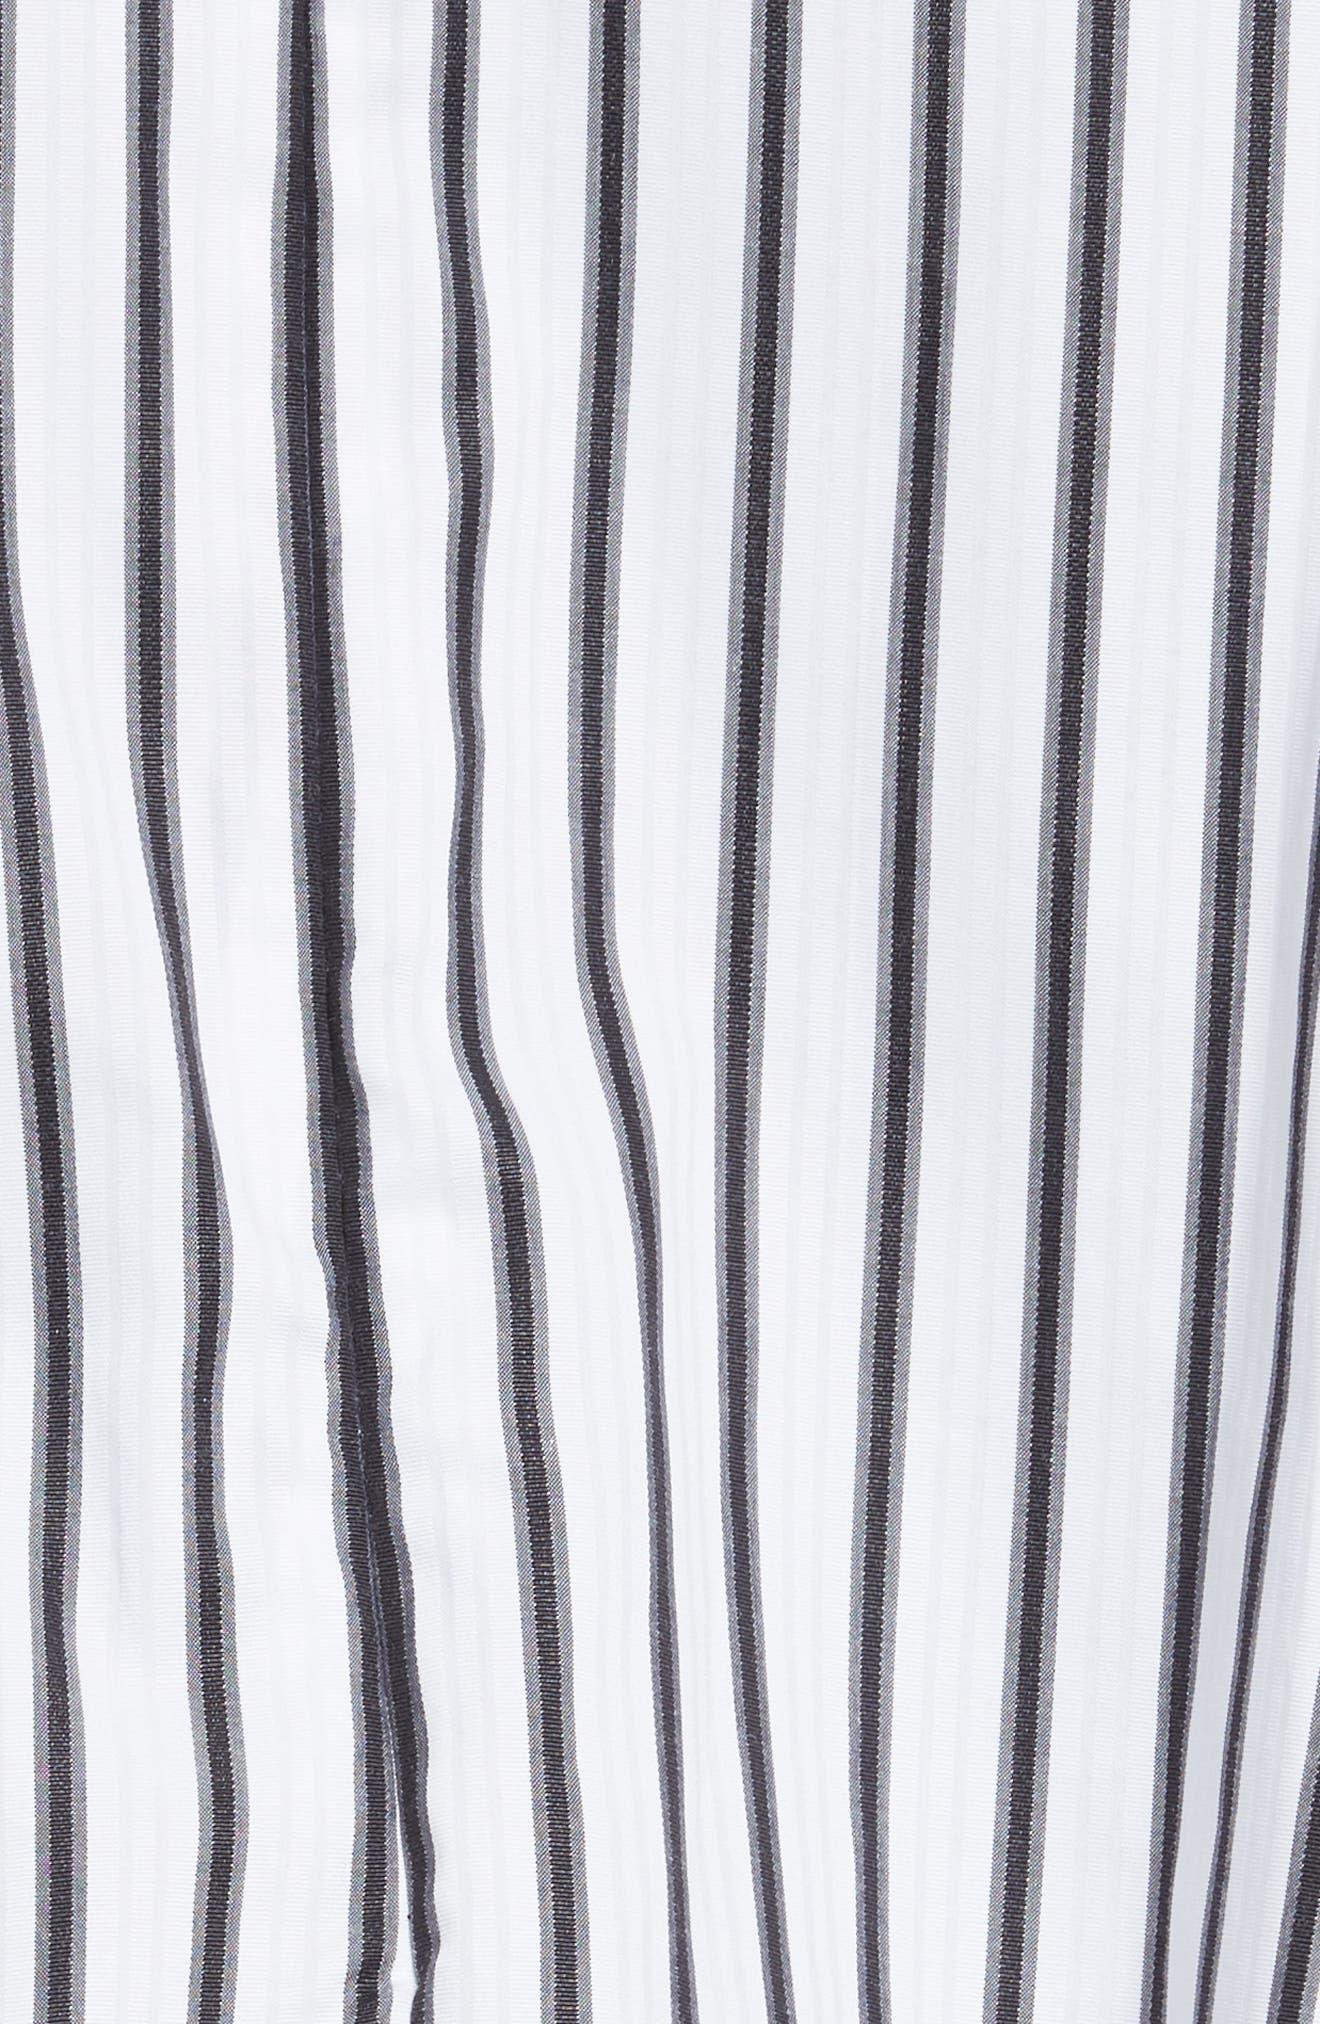 Carmen Ruffle Off the Shoulder Top,                             Alternate thumbnail 5, color,                             White/ Black